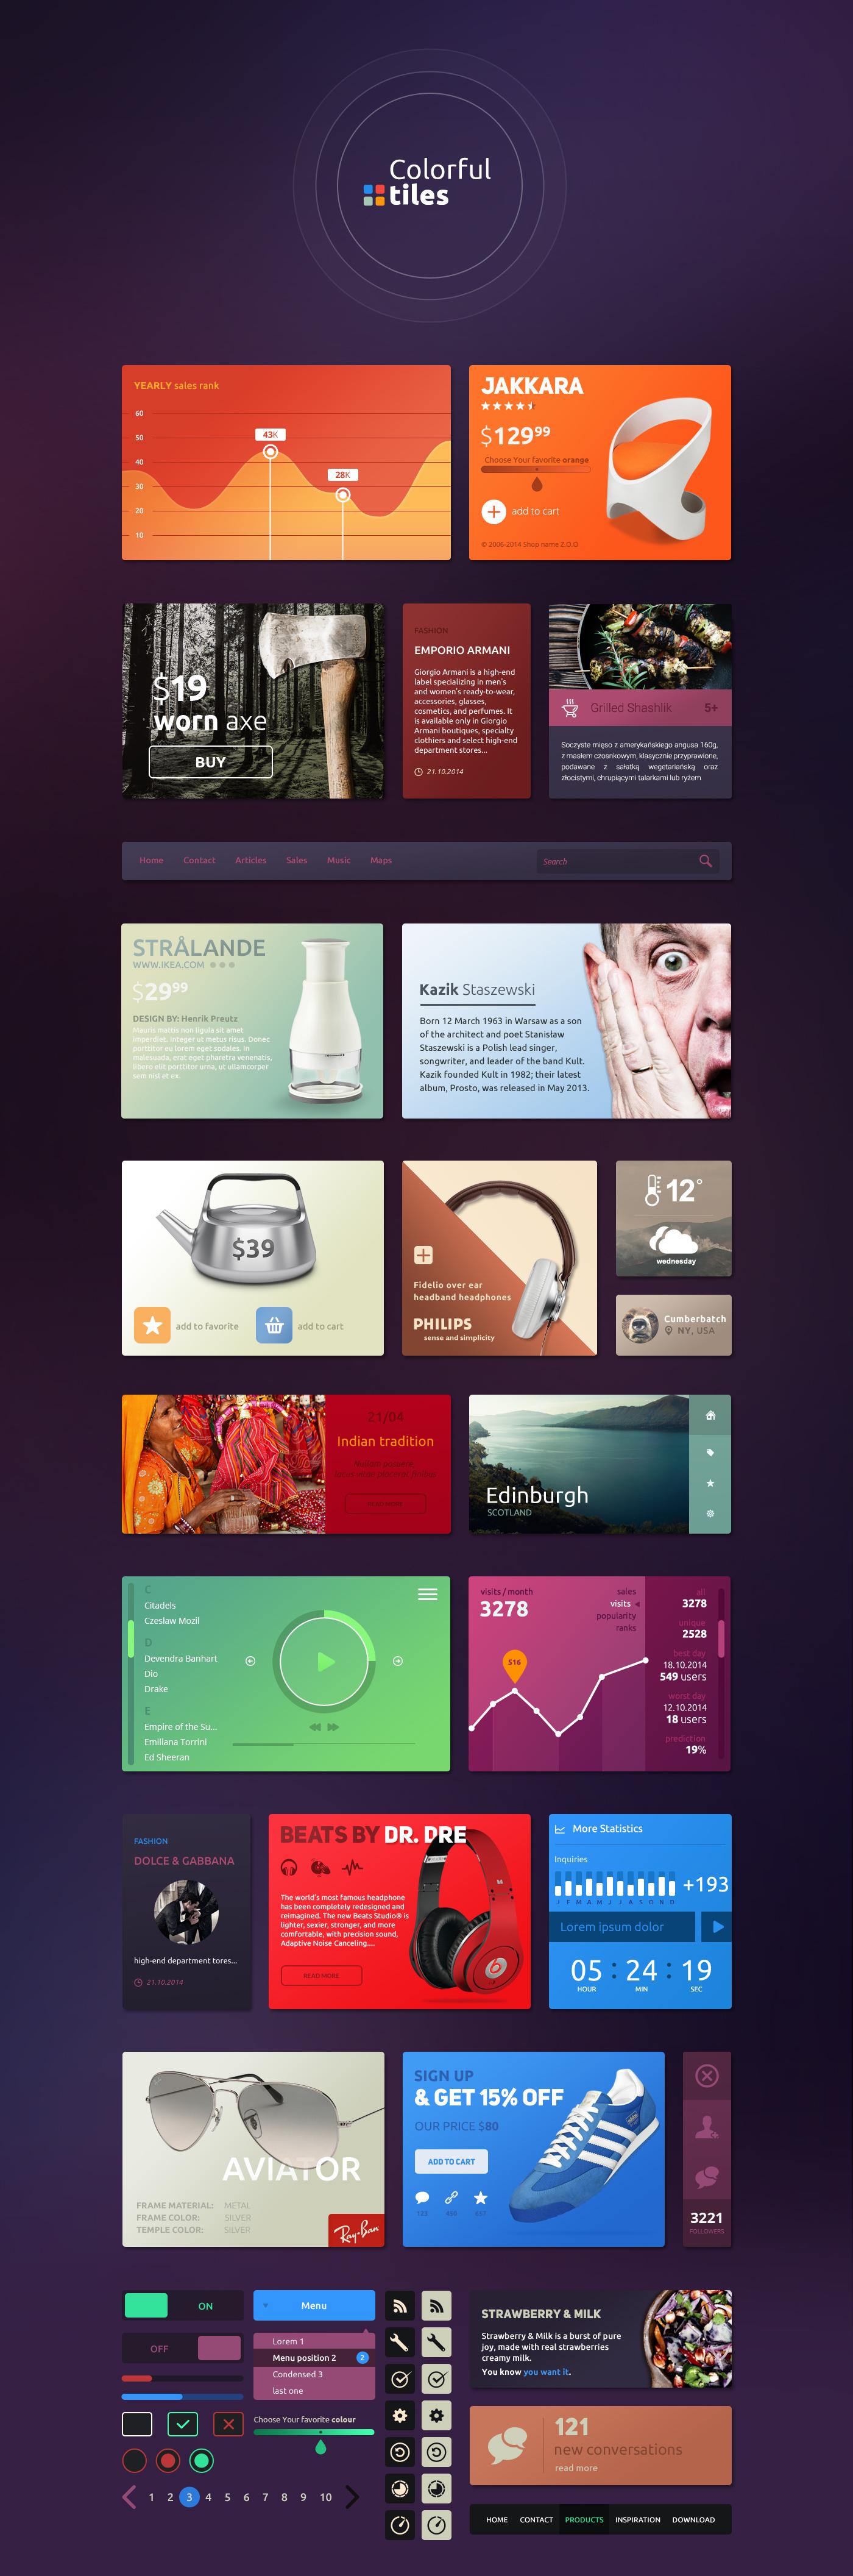 Colorful Tiles UI Kit | Craftwork – Thoroughly Handpicked UI Freebies